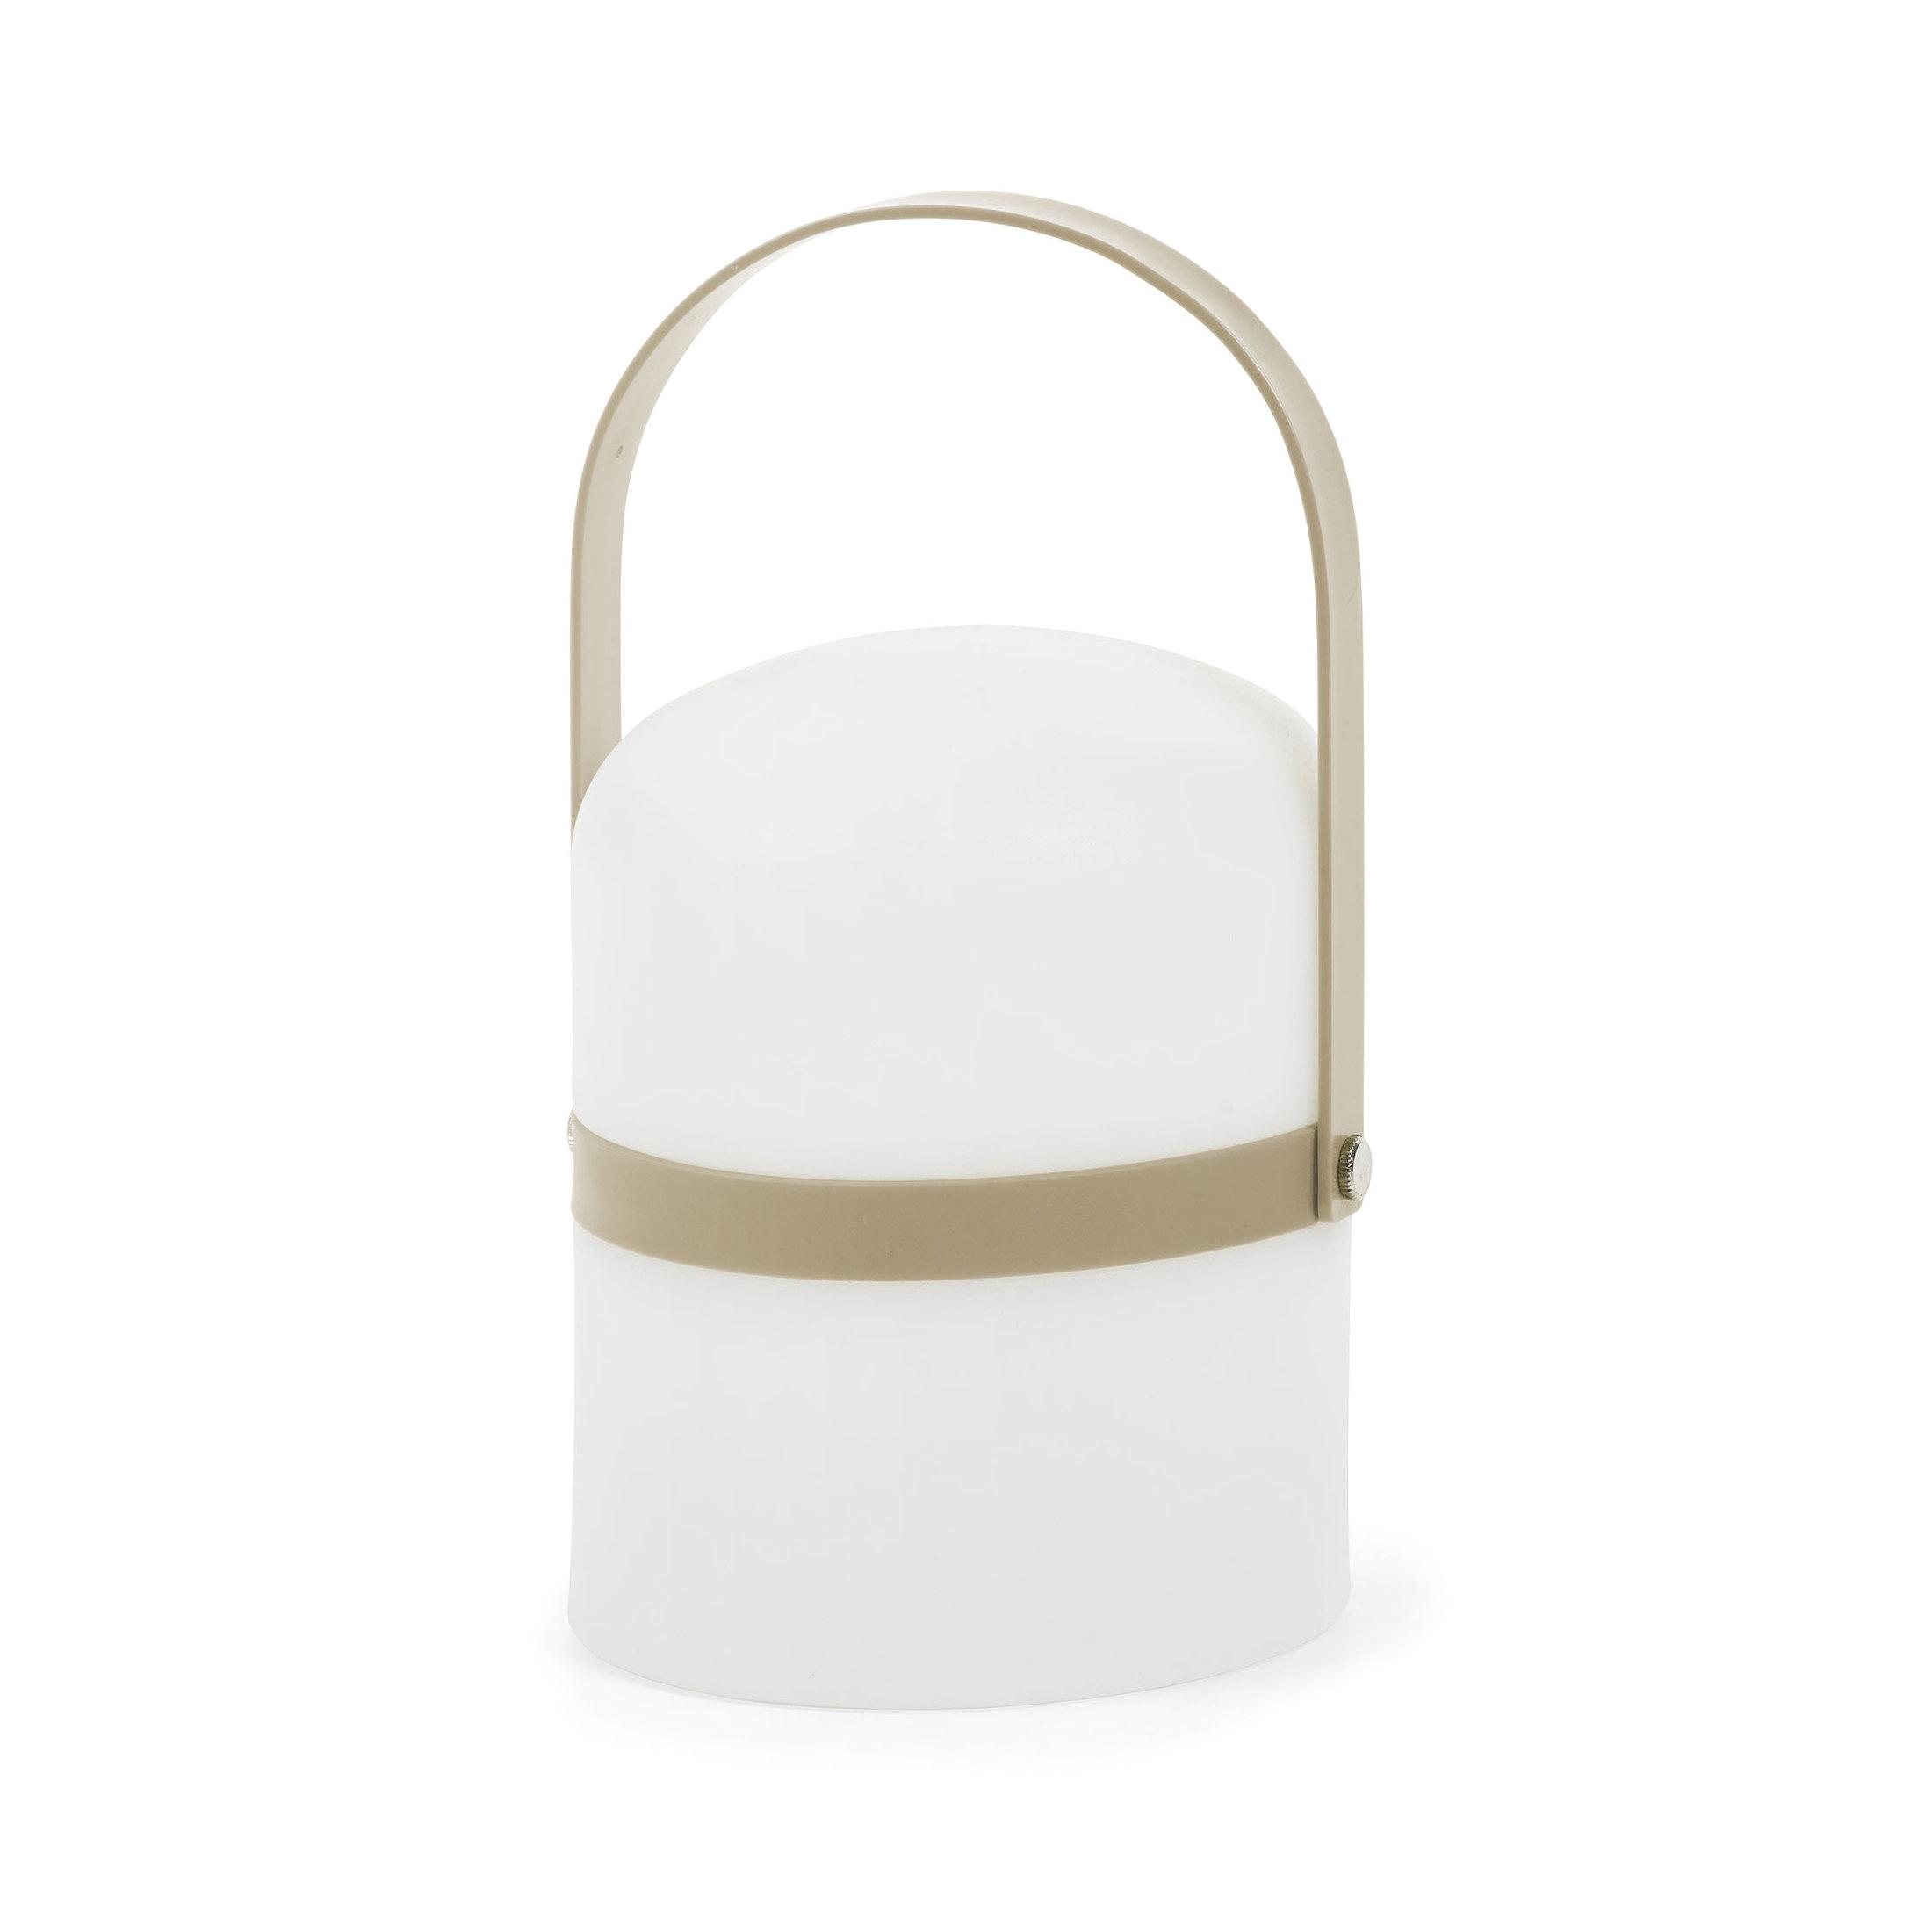 Kave Home Oplaadbare Tafellamp 'Ridley', kleur Bruin korting